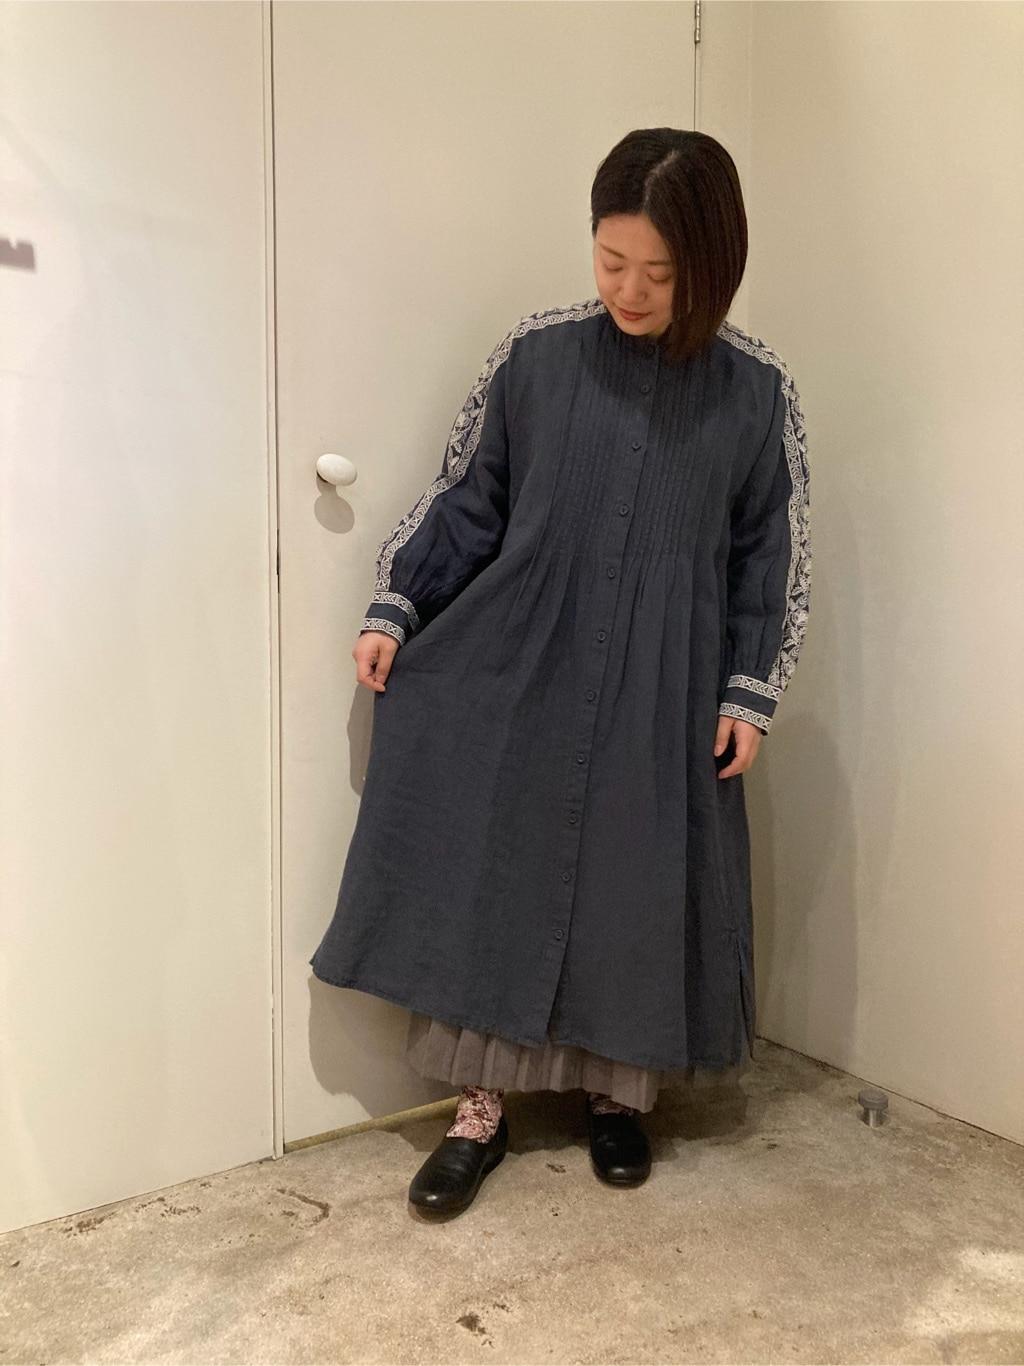 108 yuni / bulle de savon 福岡薬院路面 身長:150cm 2021.01.29